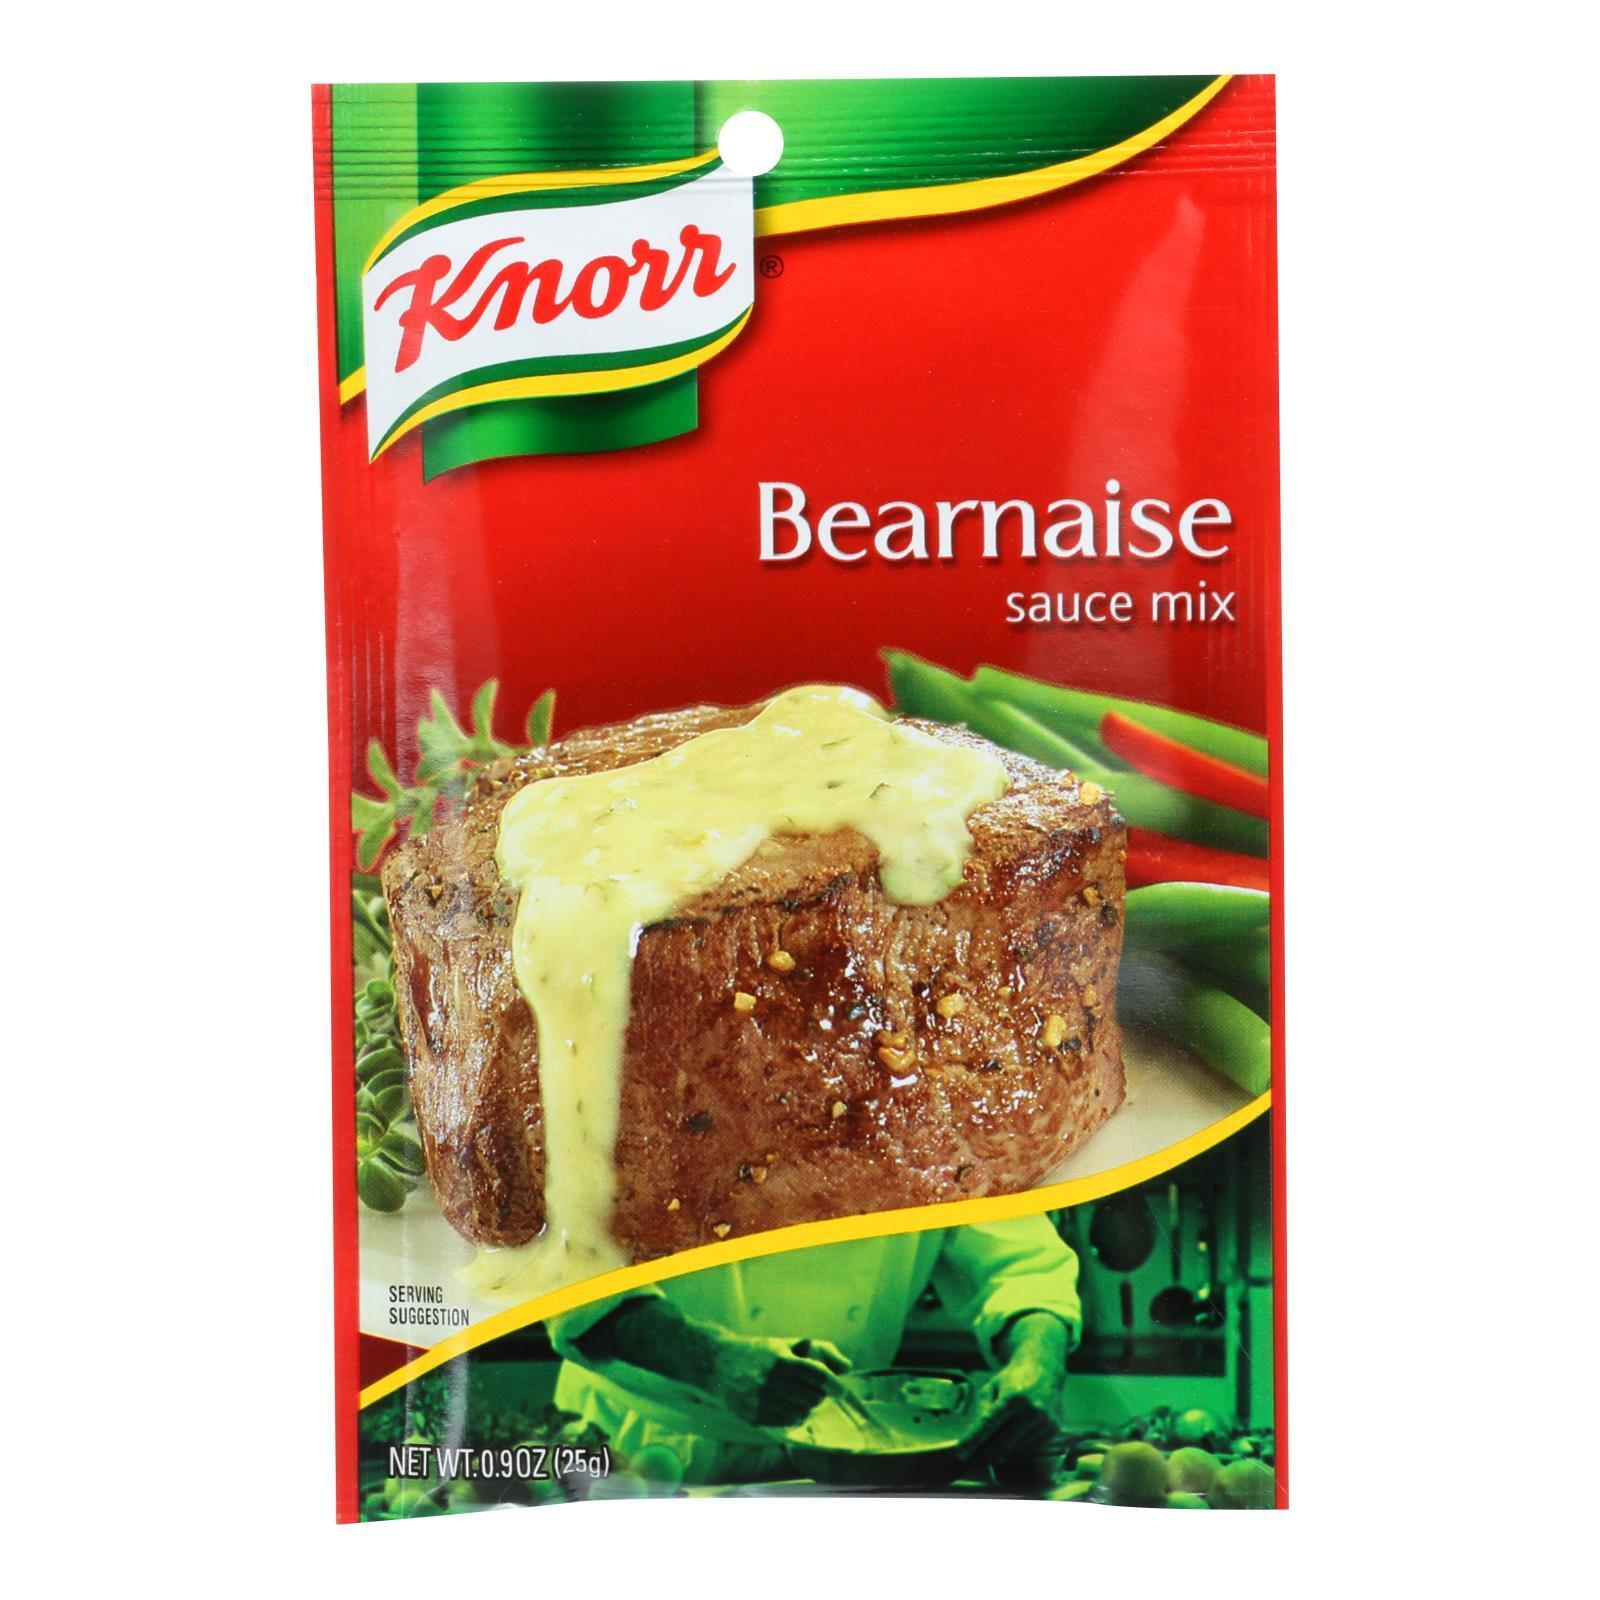 Knorr Sauce Mix - Bernaise - .9 oz - Case of 12